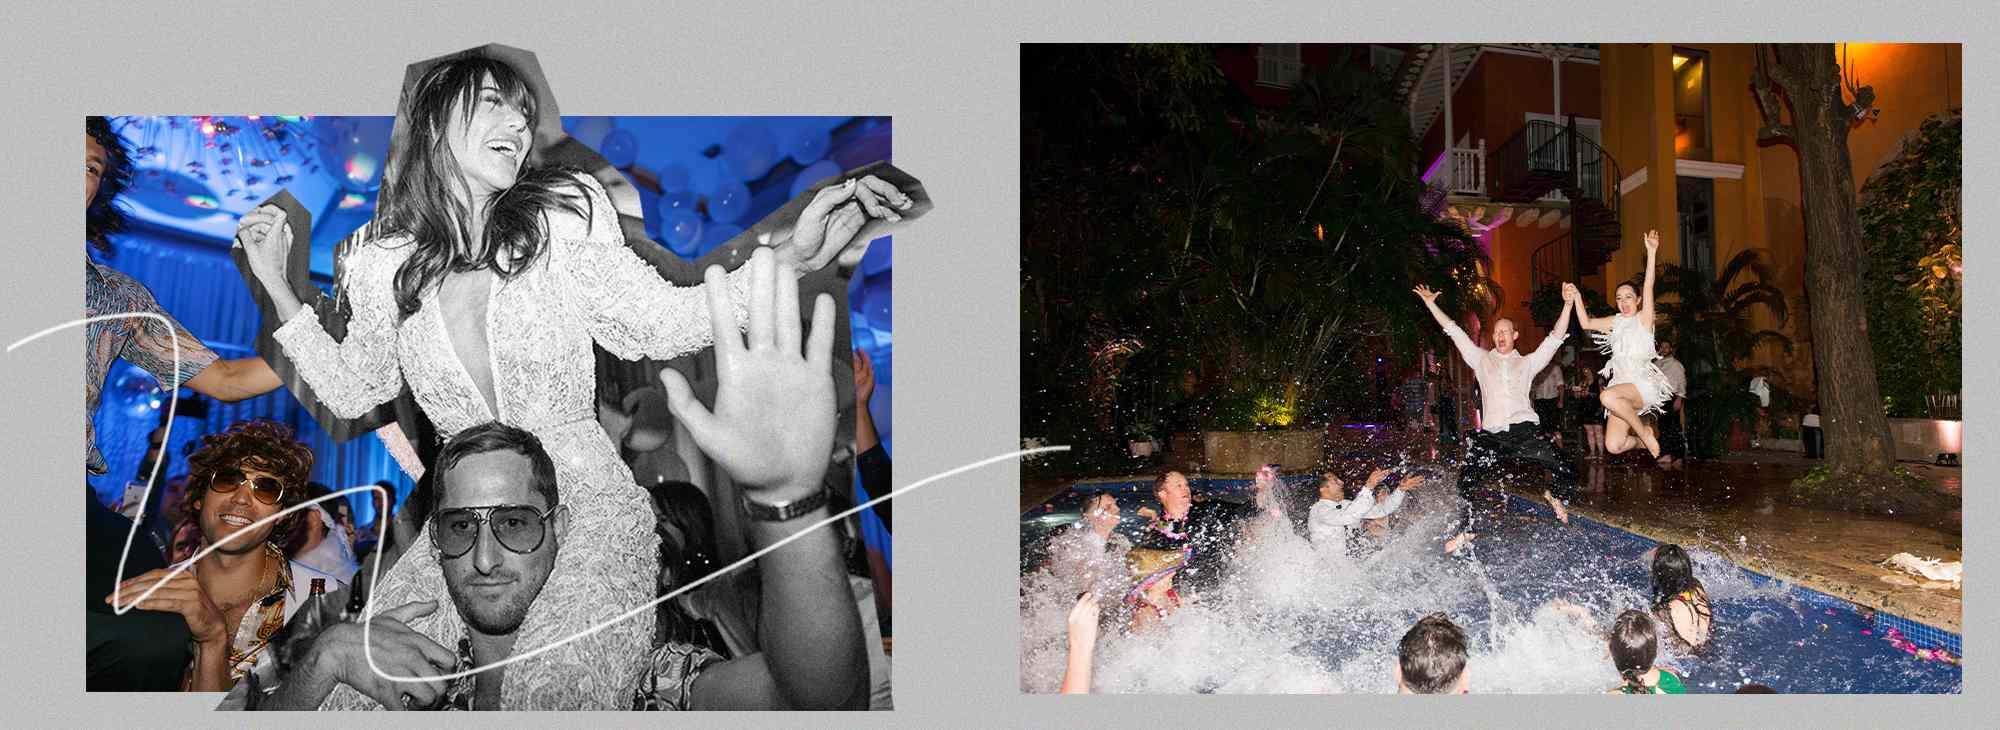 bride dancing at wedding, bride and groom jumping into pool